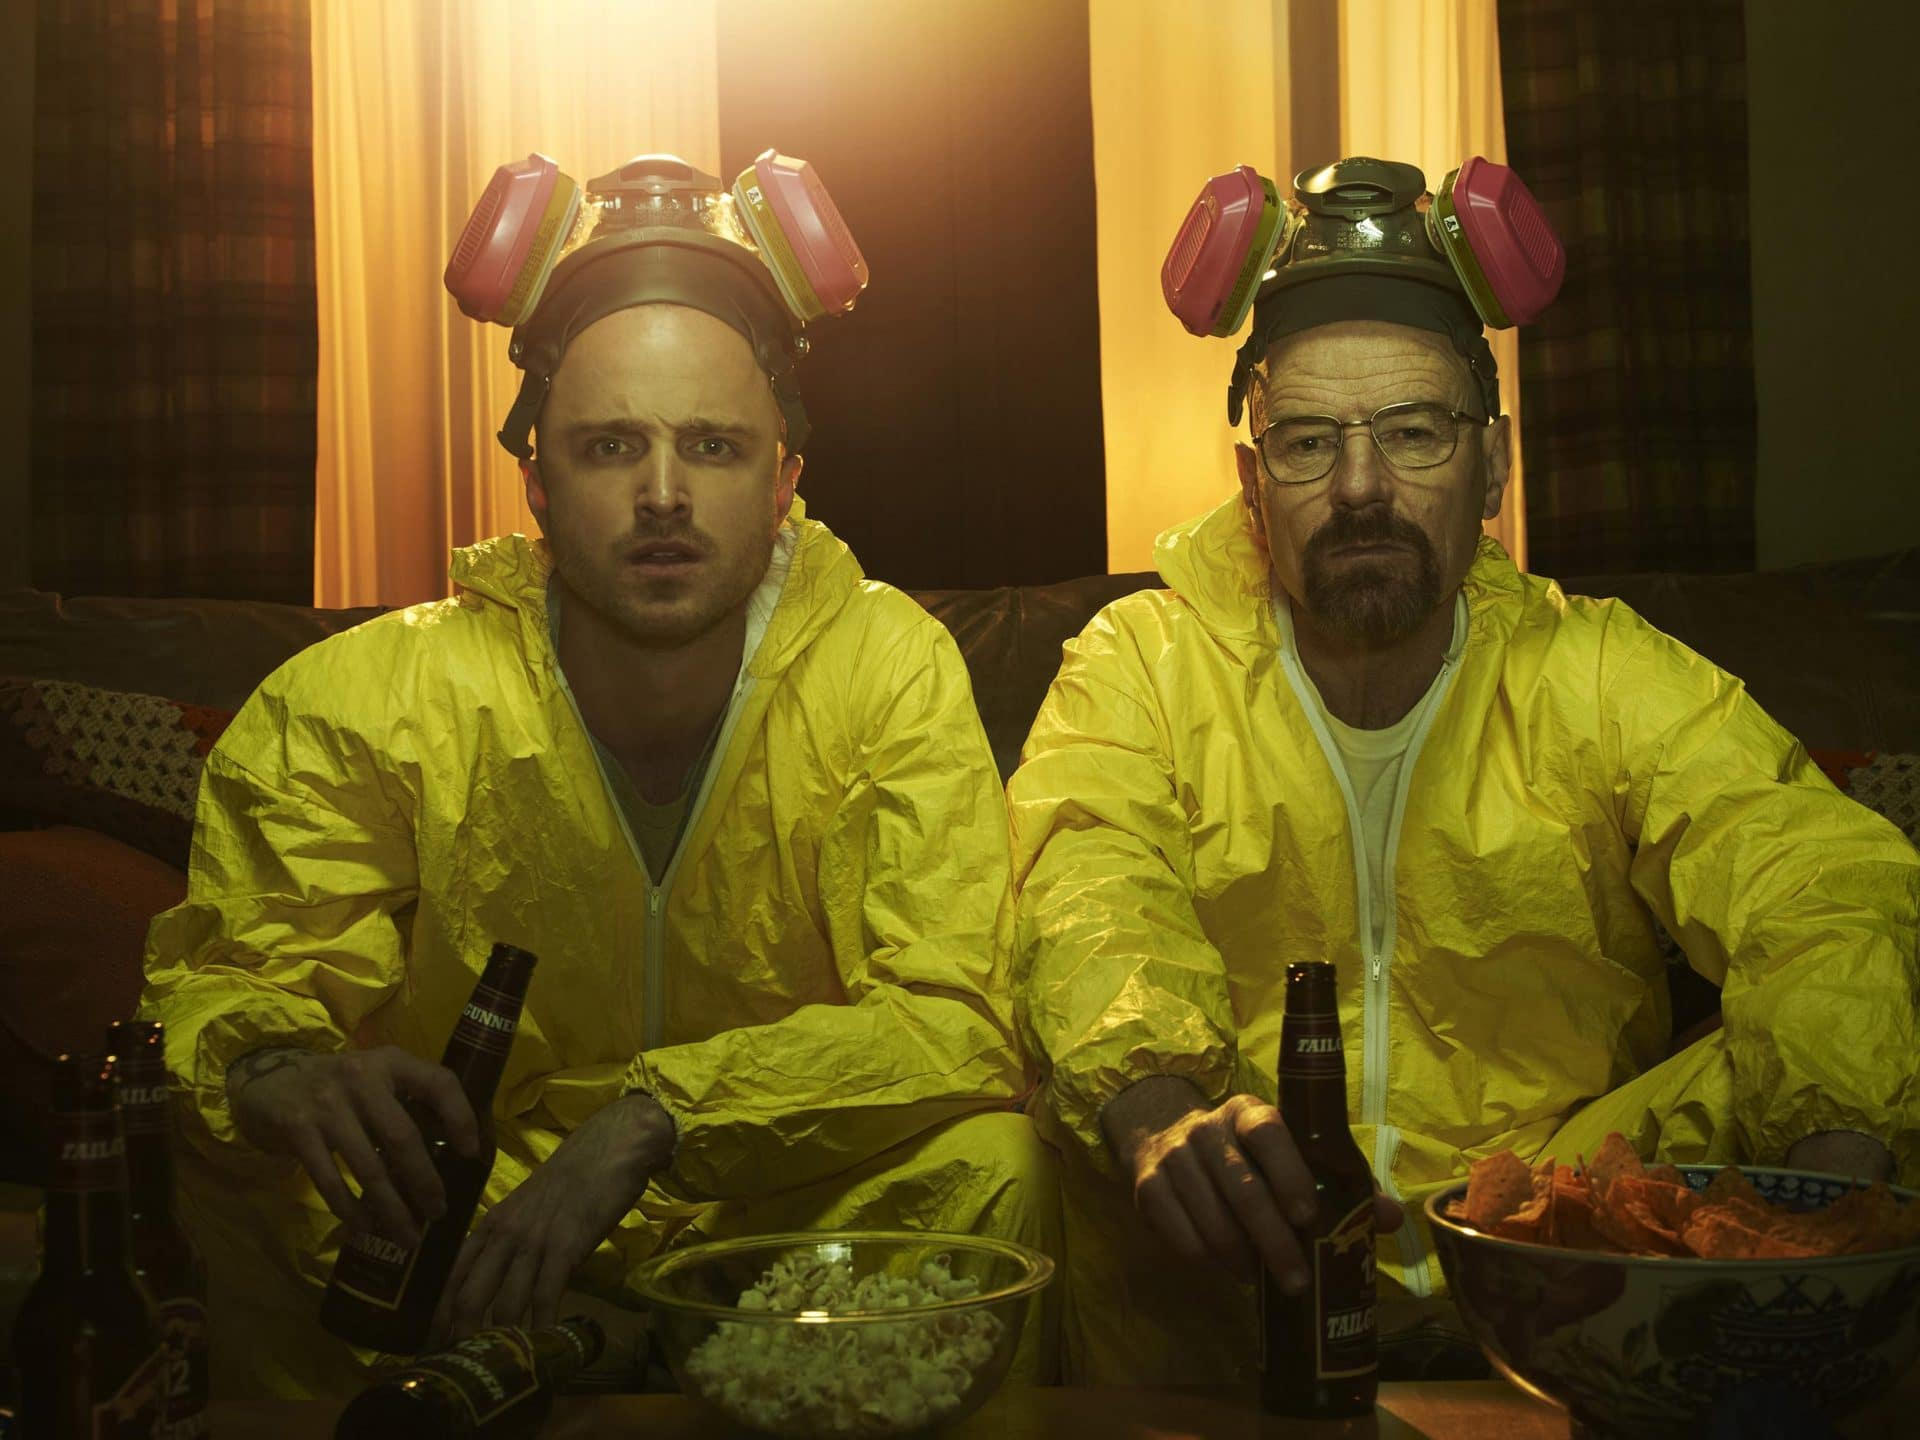 Breaking Bad, il film in arrivo su Netflix: teaser e data d'uscita thumbnail